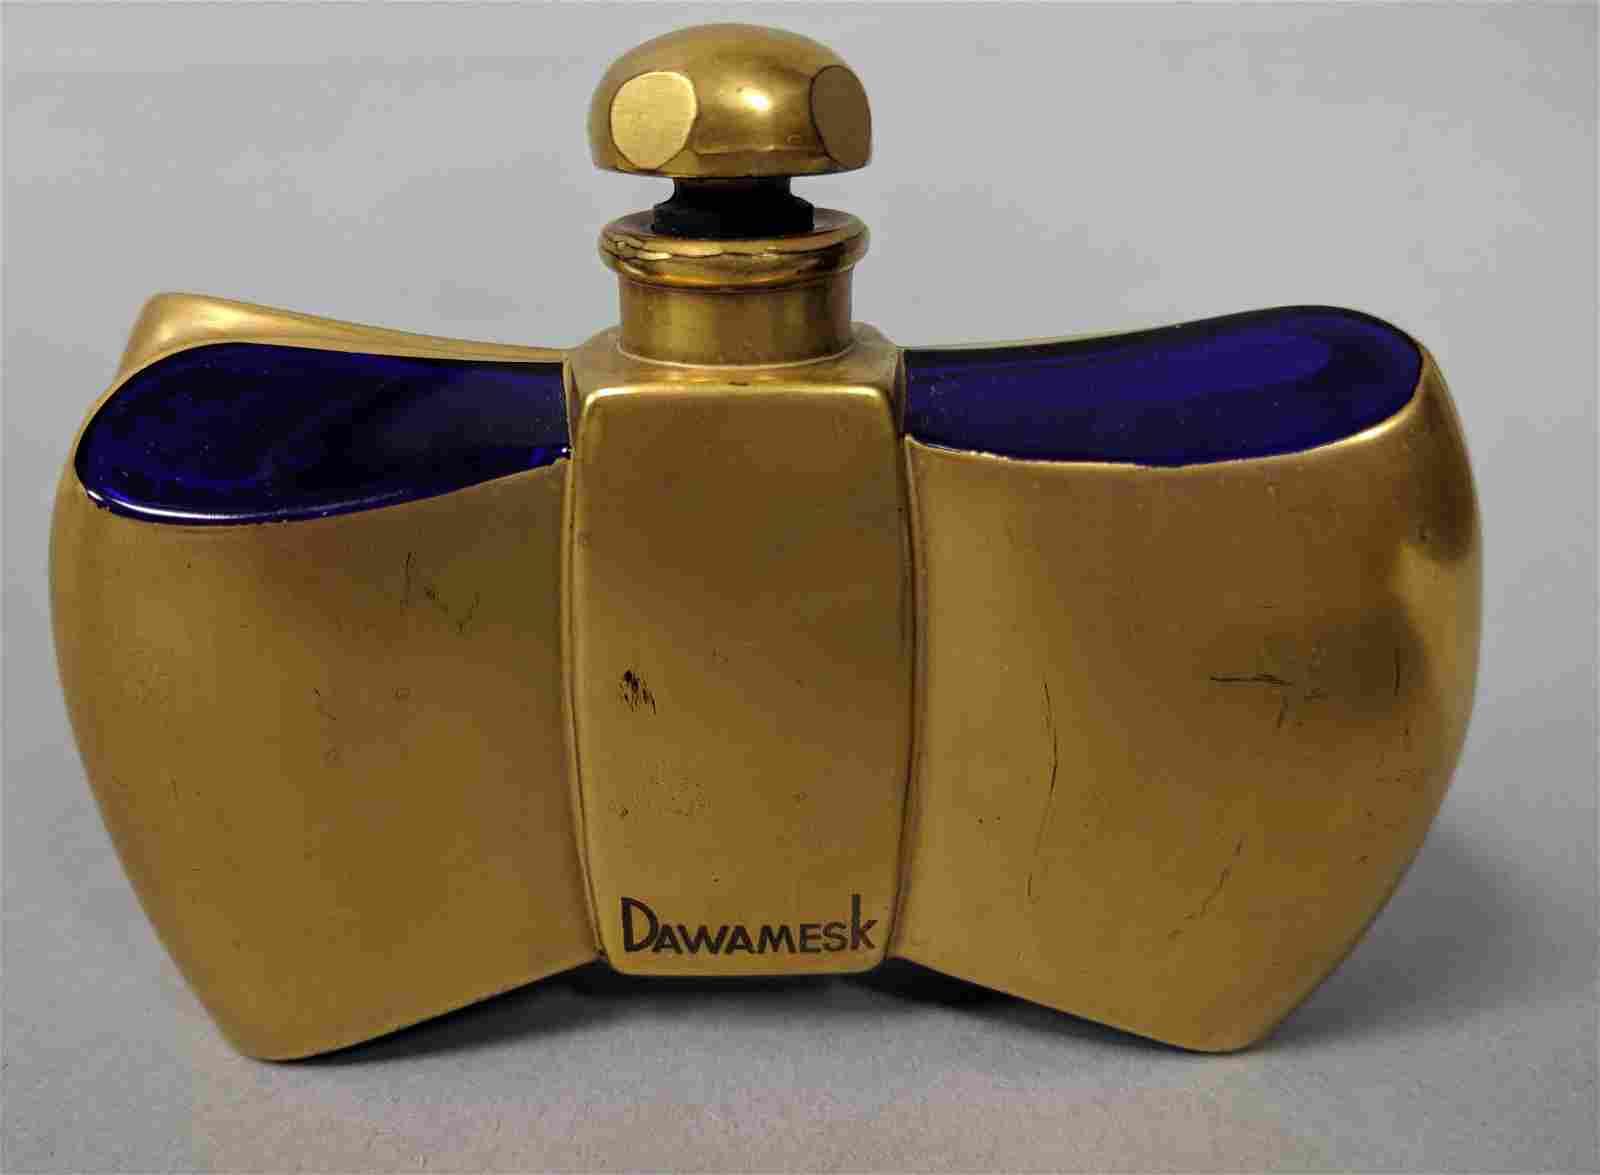 BACCARAT French Crystal GUERLAIN Perfume Bottle.